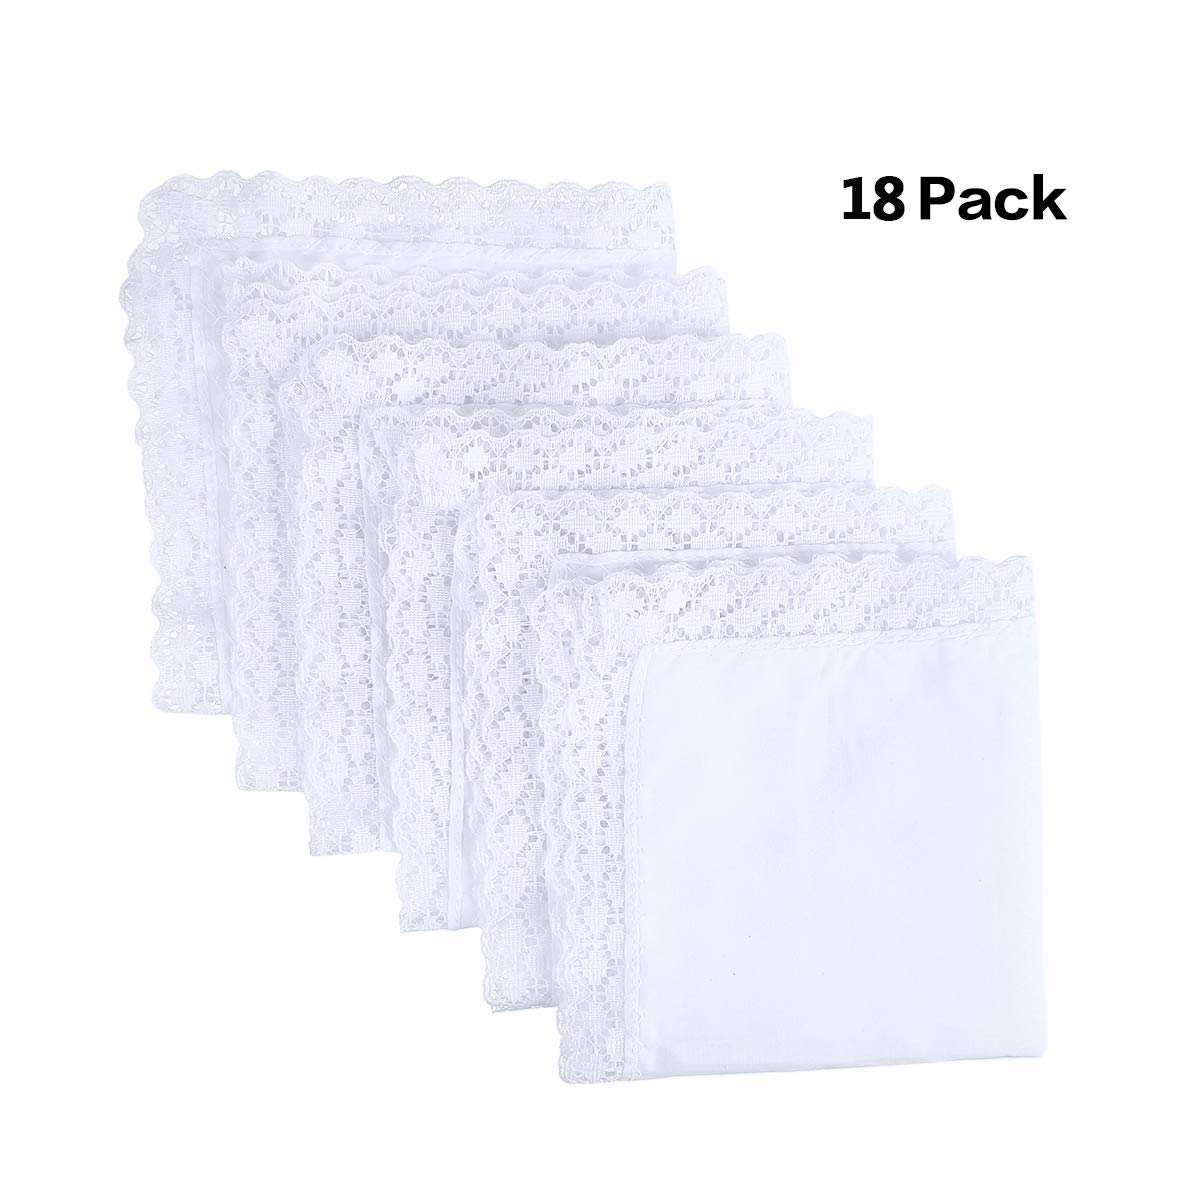 Houlife 100% Cotton Women's Pure White Handkerchief with Lace Edges (18Pcs)